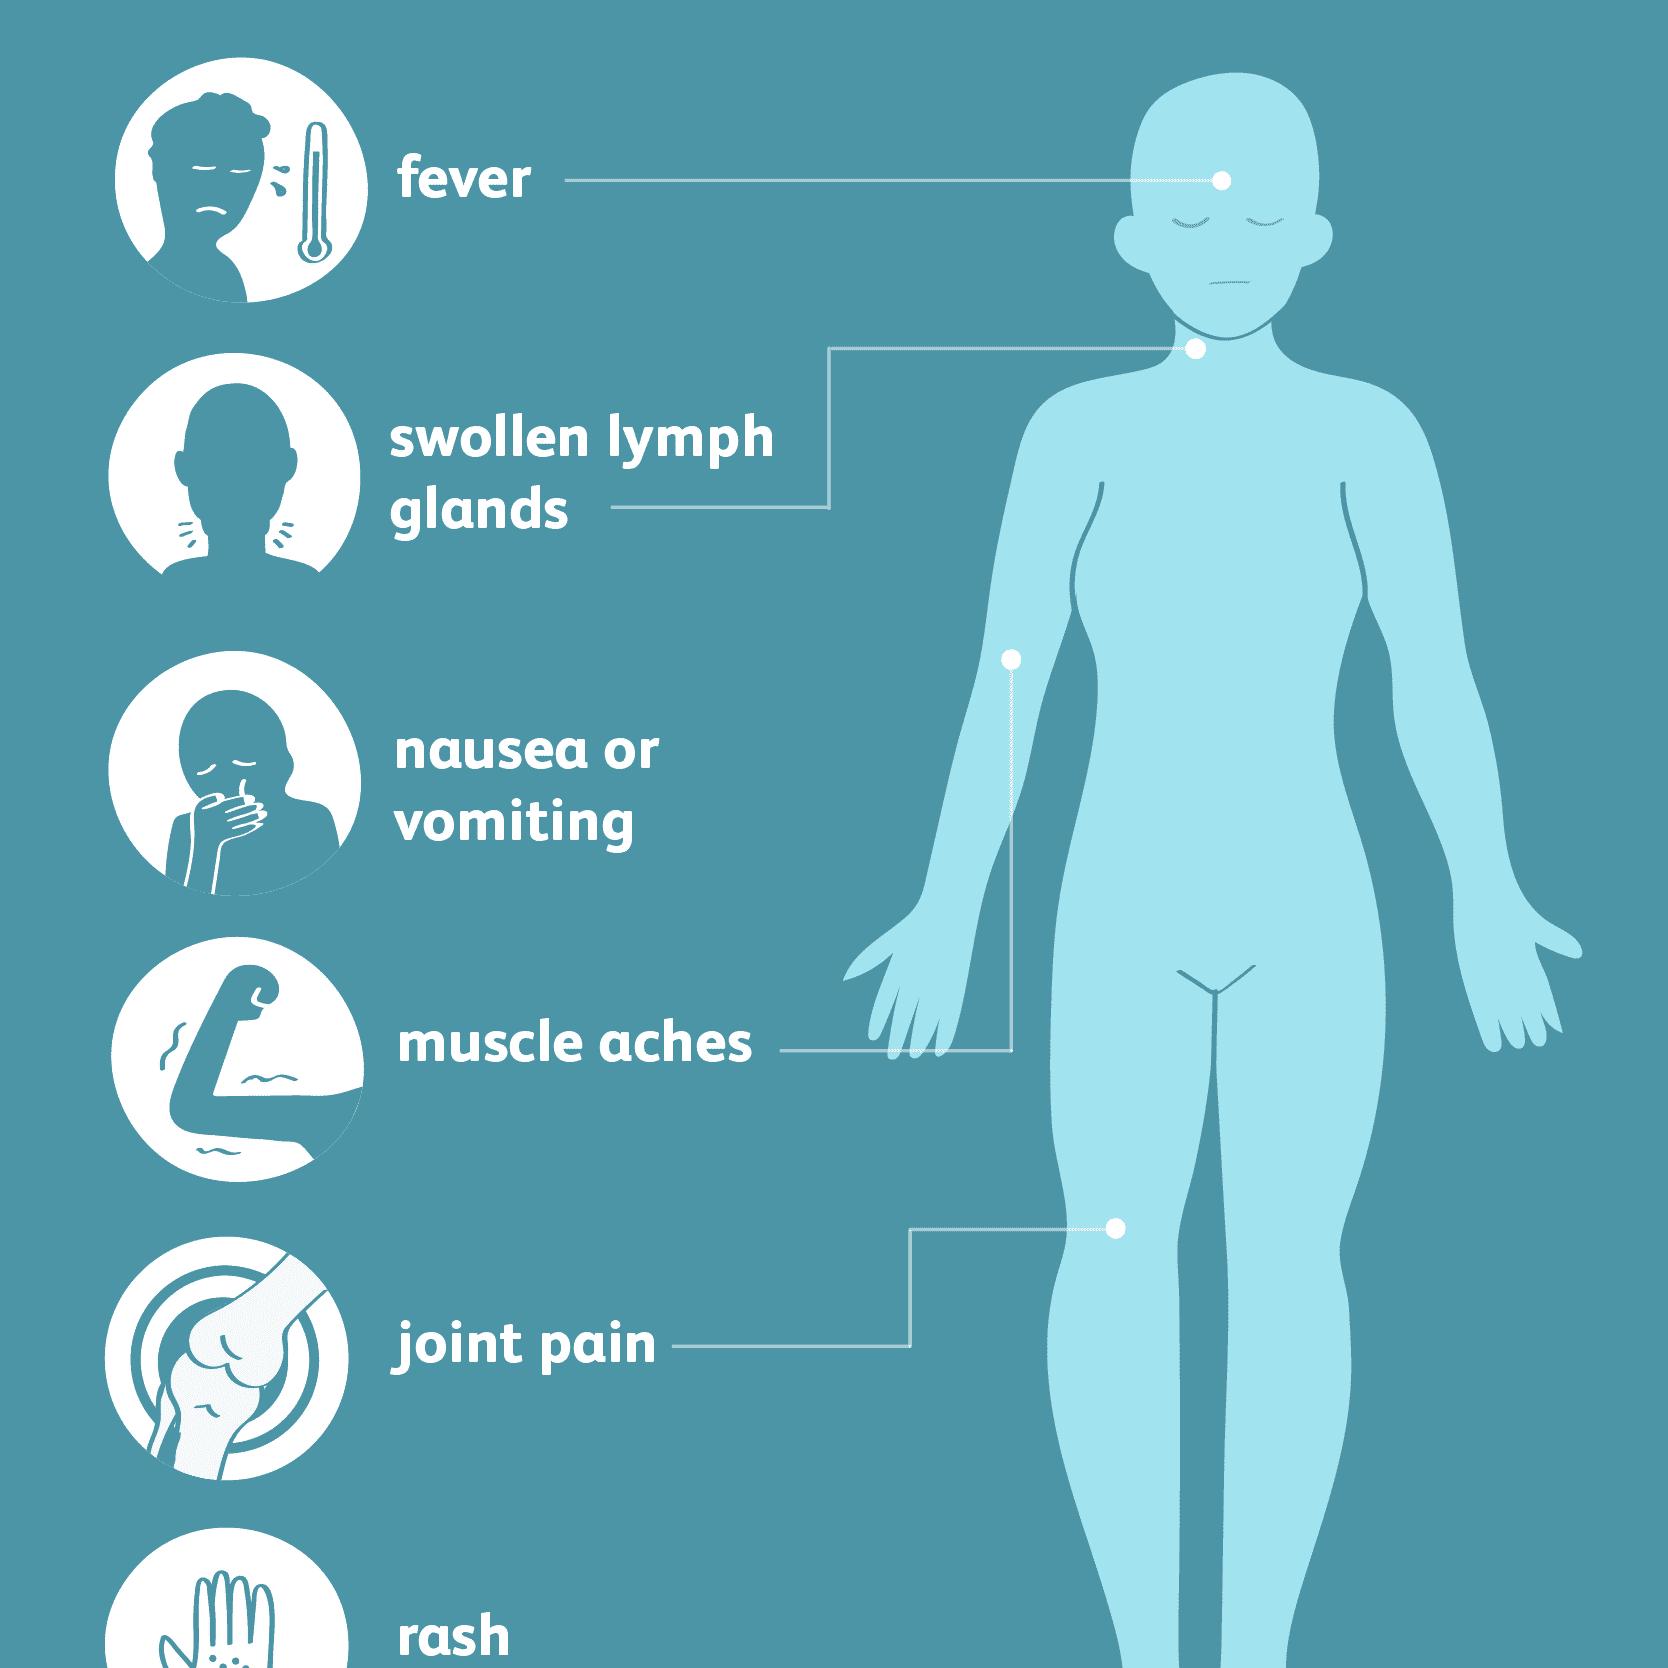 West Nile virus: common symptoms